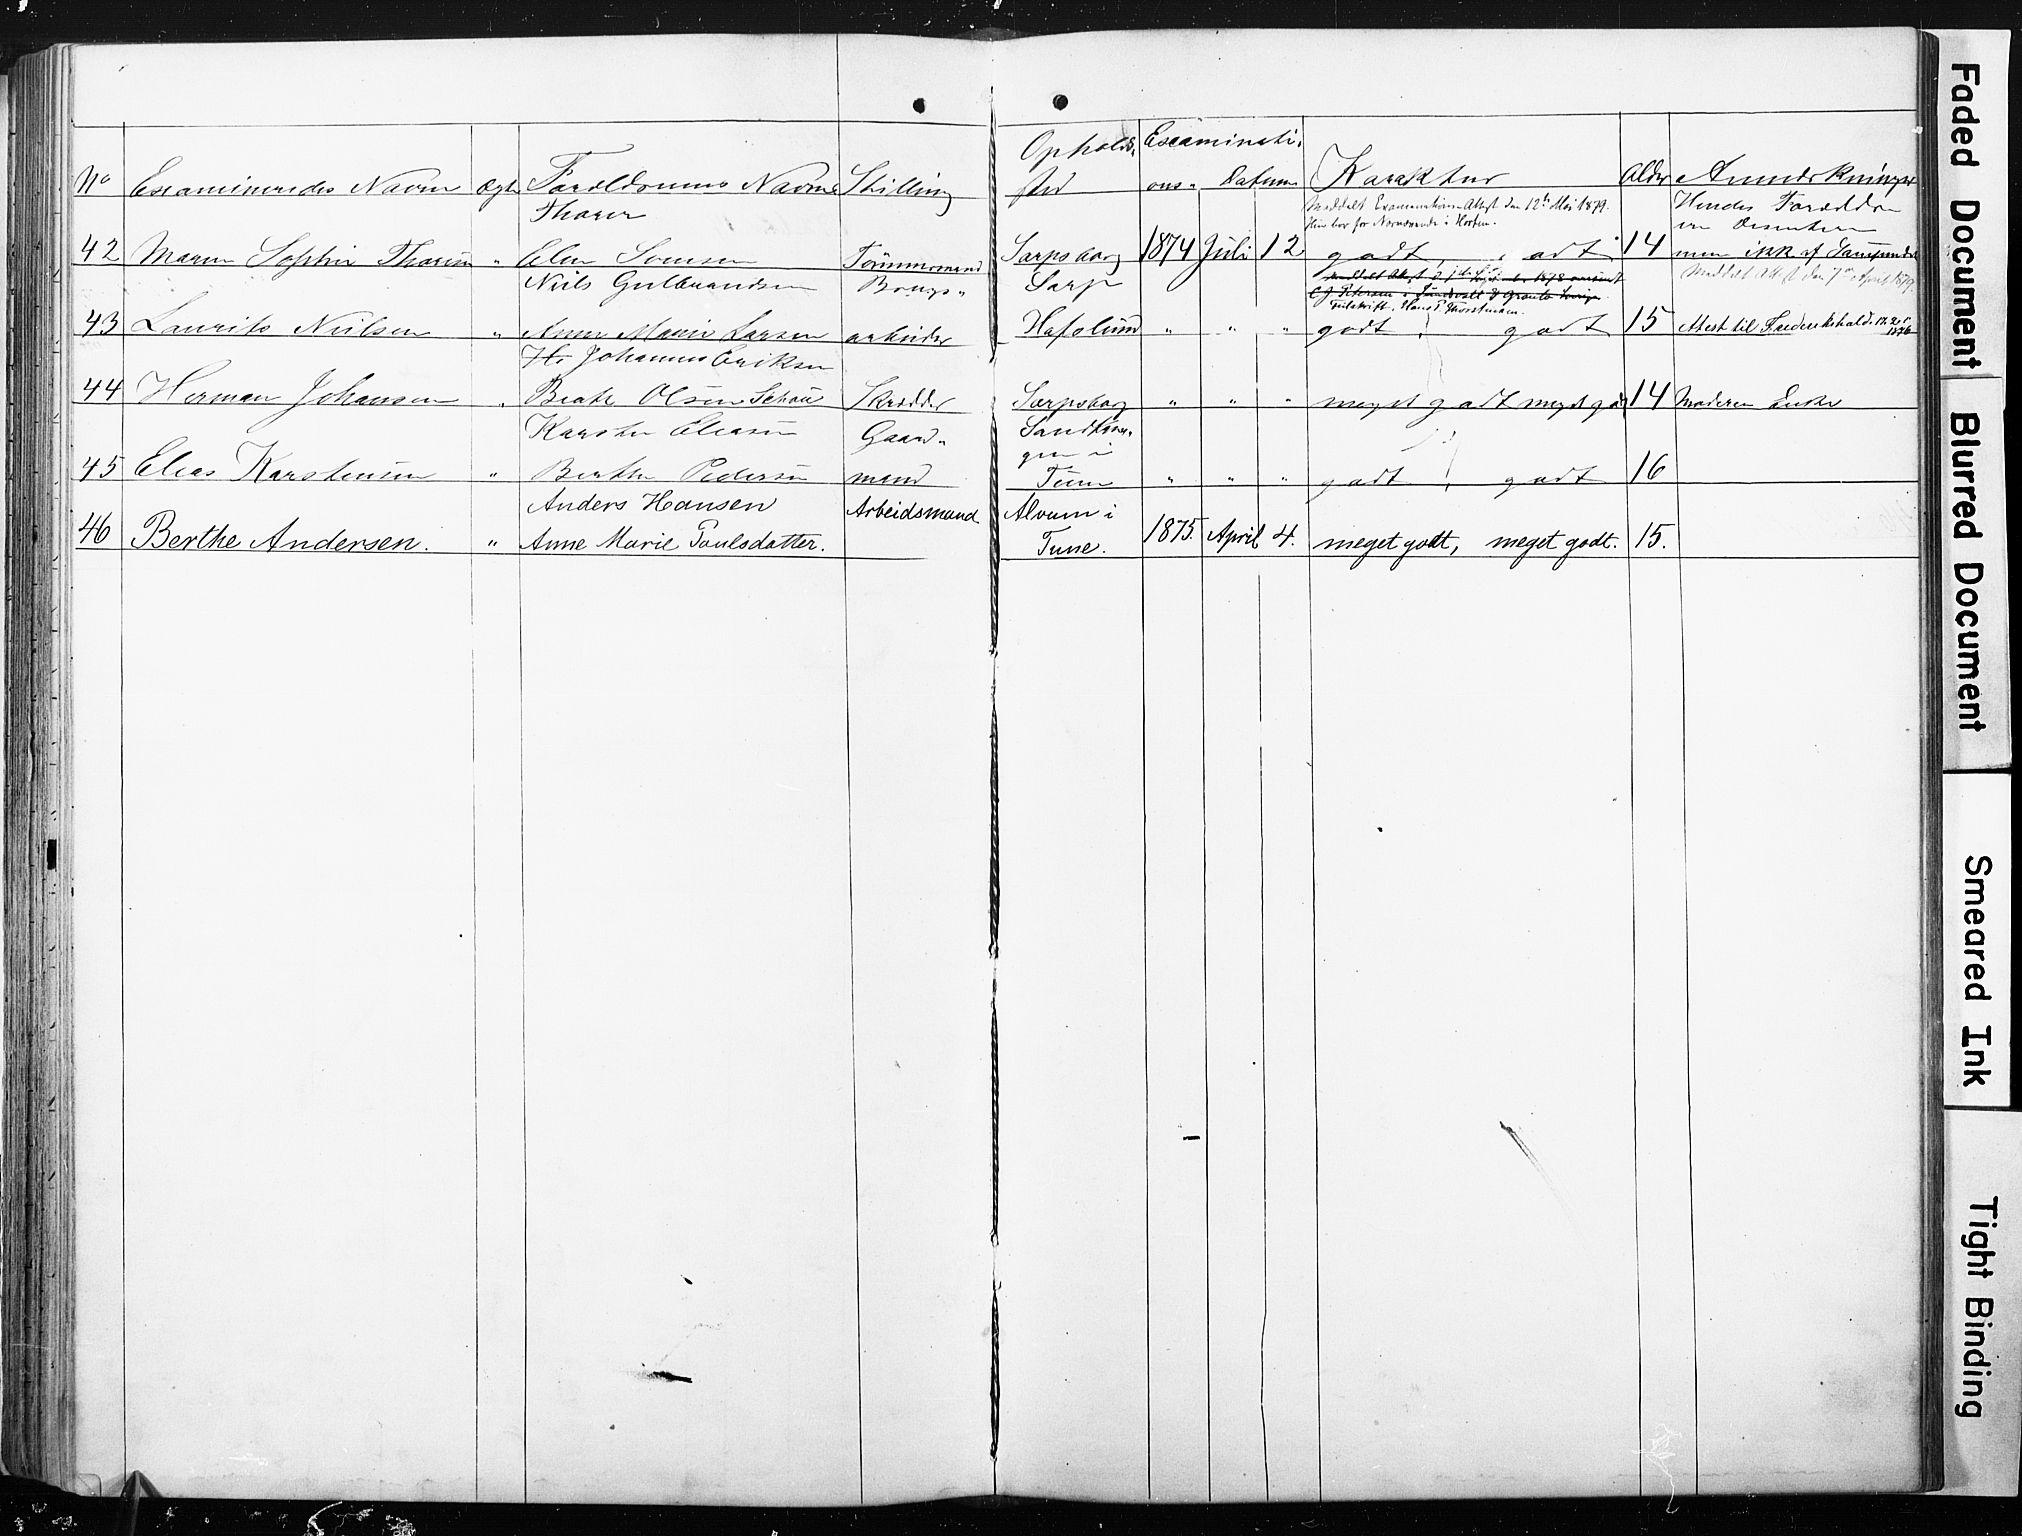 SAO, Sarpsborg metodistkirke, A/L0001: Dissenterprotokoll nr. 1, 1856-1875